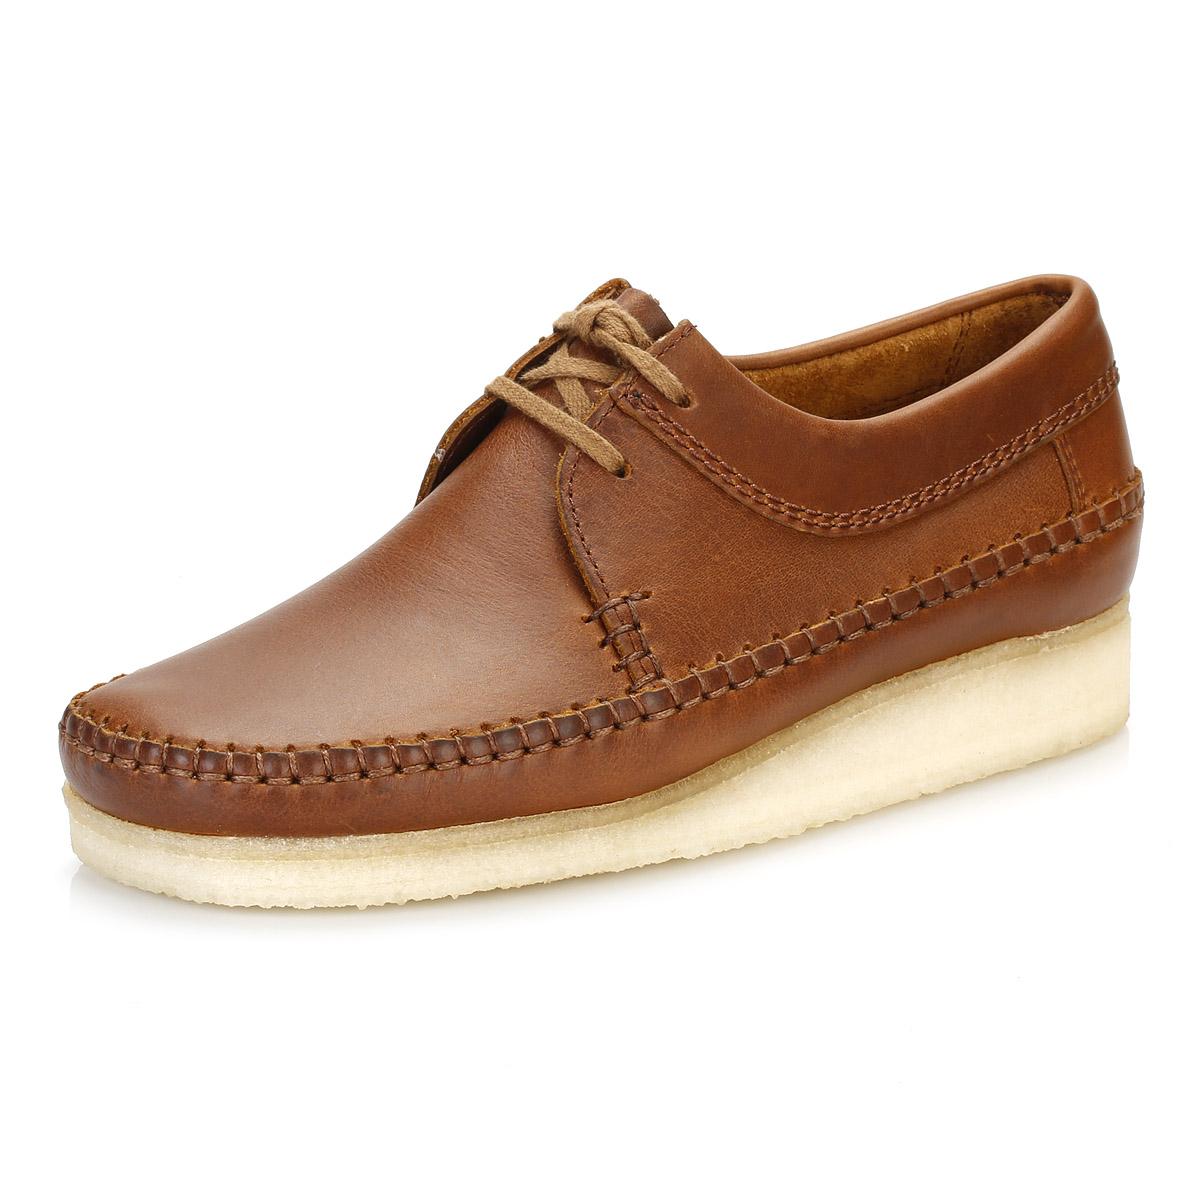 Clarks Tan Womens Shoes